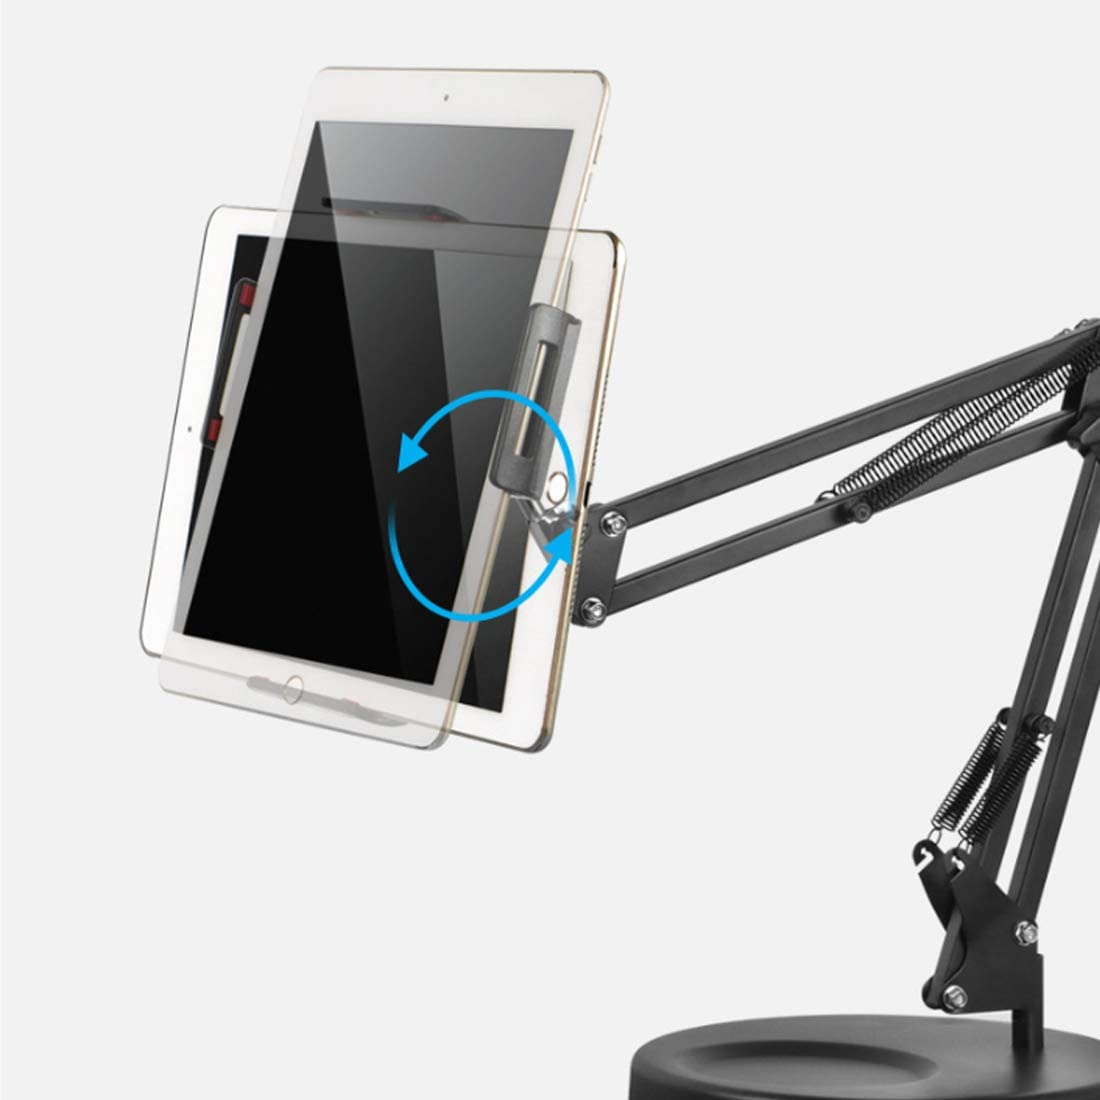 DLMPT LED Adjustable Ring Light with Desktop Stand and Phone Holder Dimmable 3 Light Modes Level 10 Brightness Ringlight Make Up Light for YouTube Vlog Makeup Video Shooting Selfie,26cm,Tabletclip